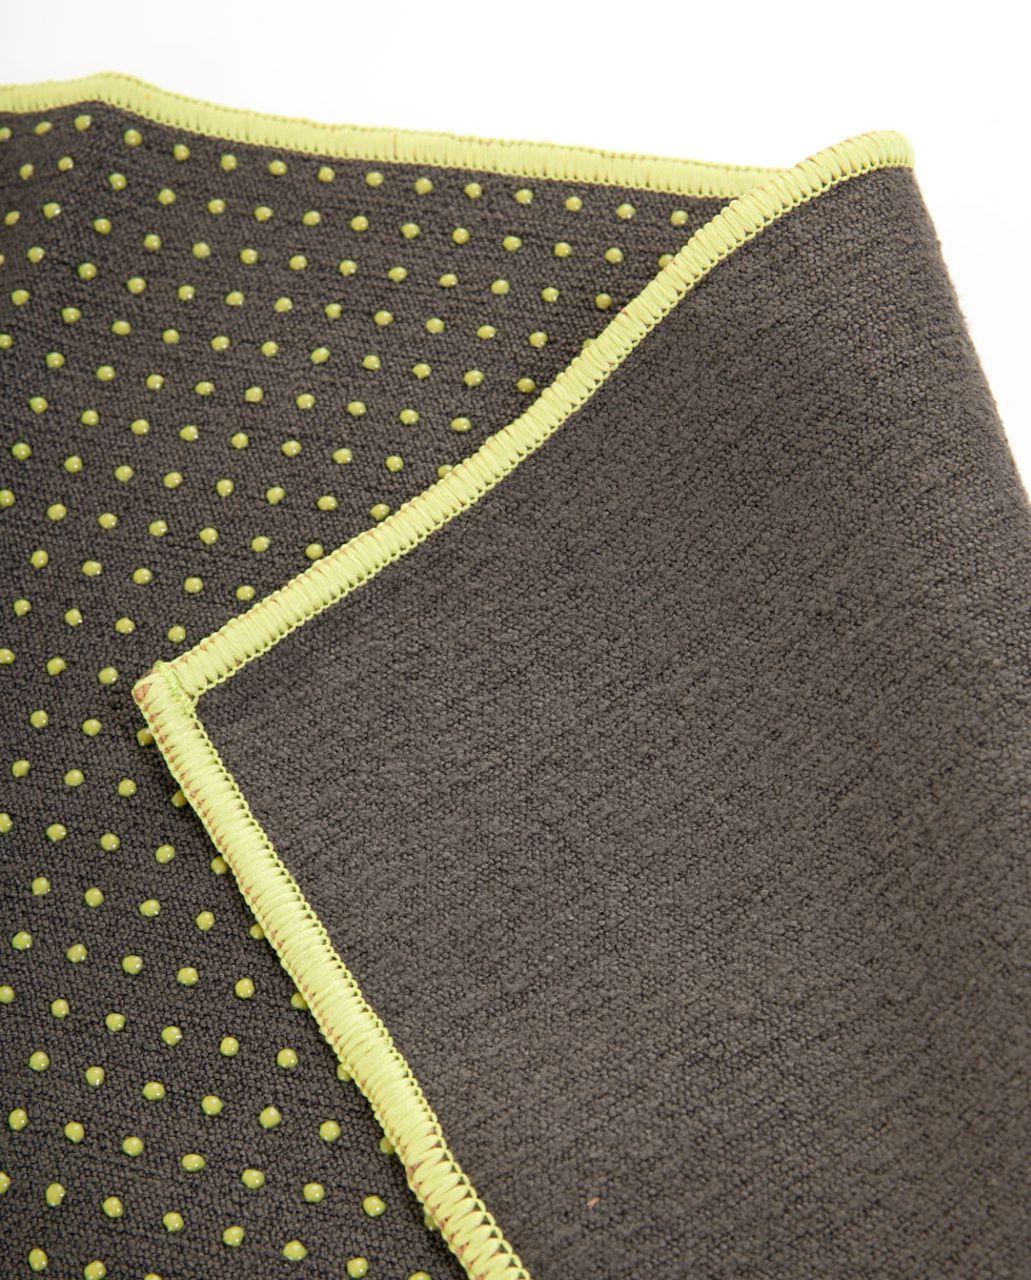 Lululemon Skidless Towel - Deep Camo